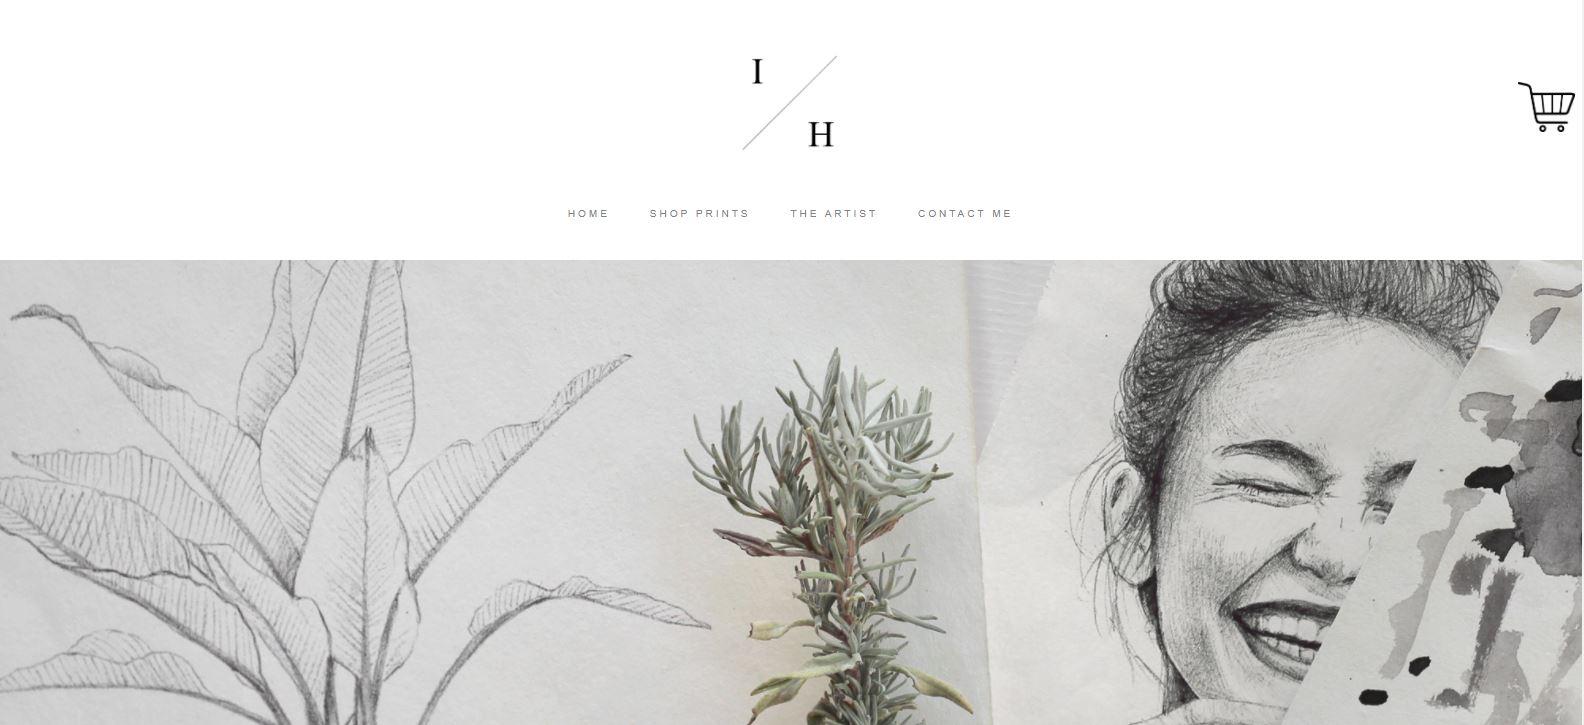 ingridhallart.com